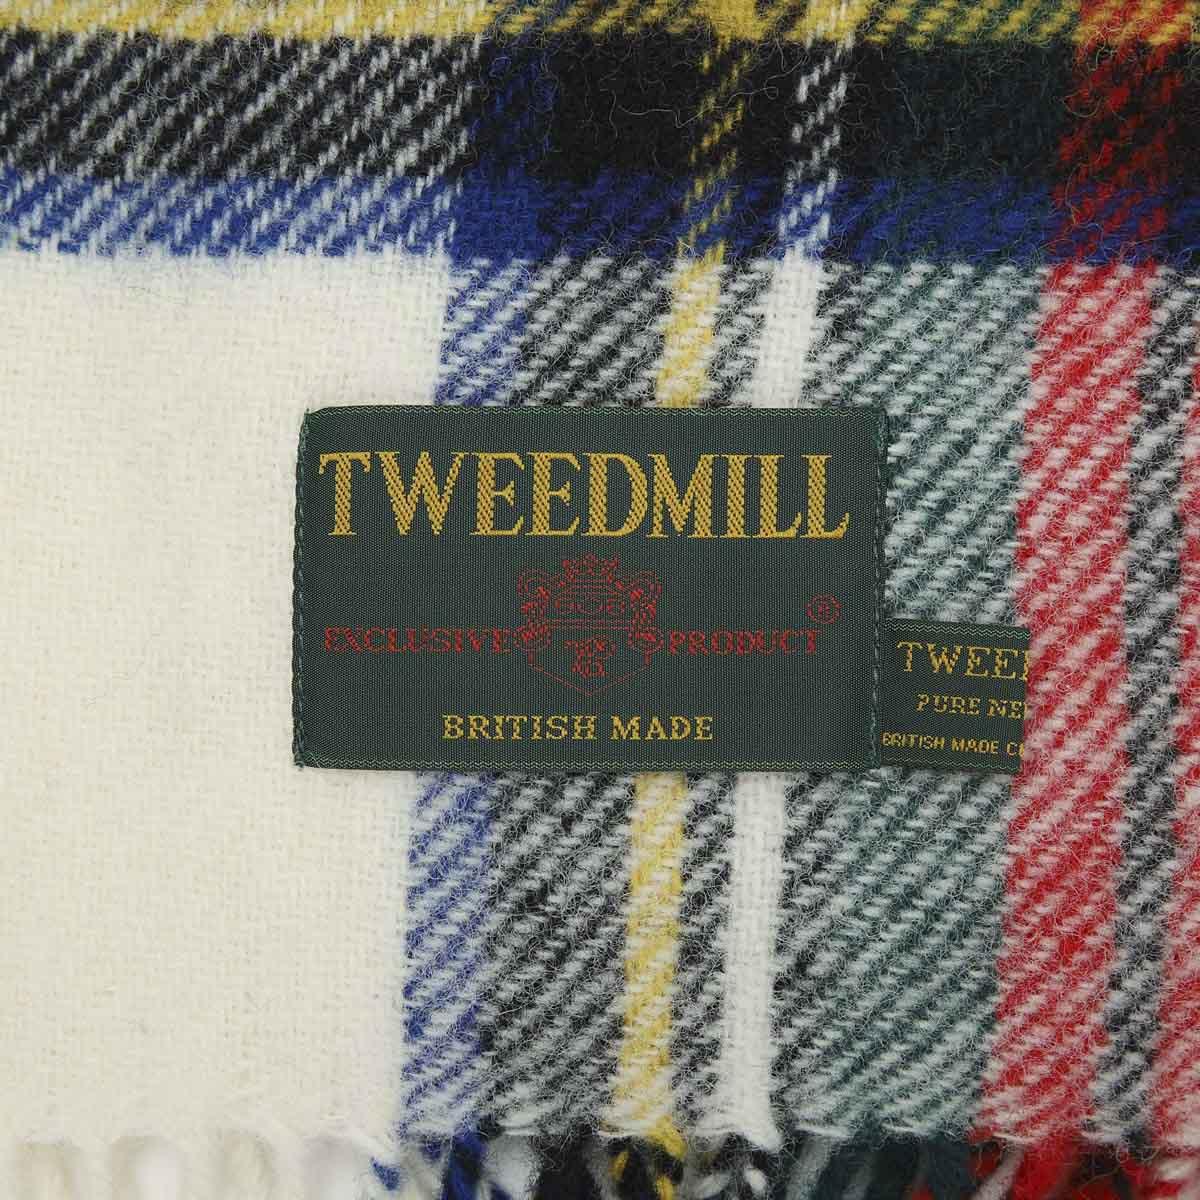 TWEEDMILL ツイードミル 大判 ストール/ブランケット/THTAK レディース